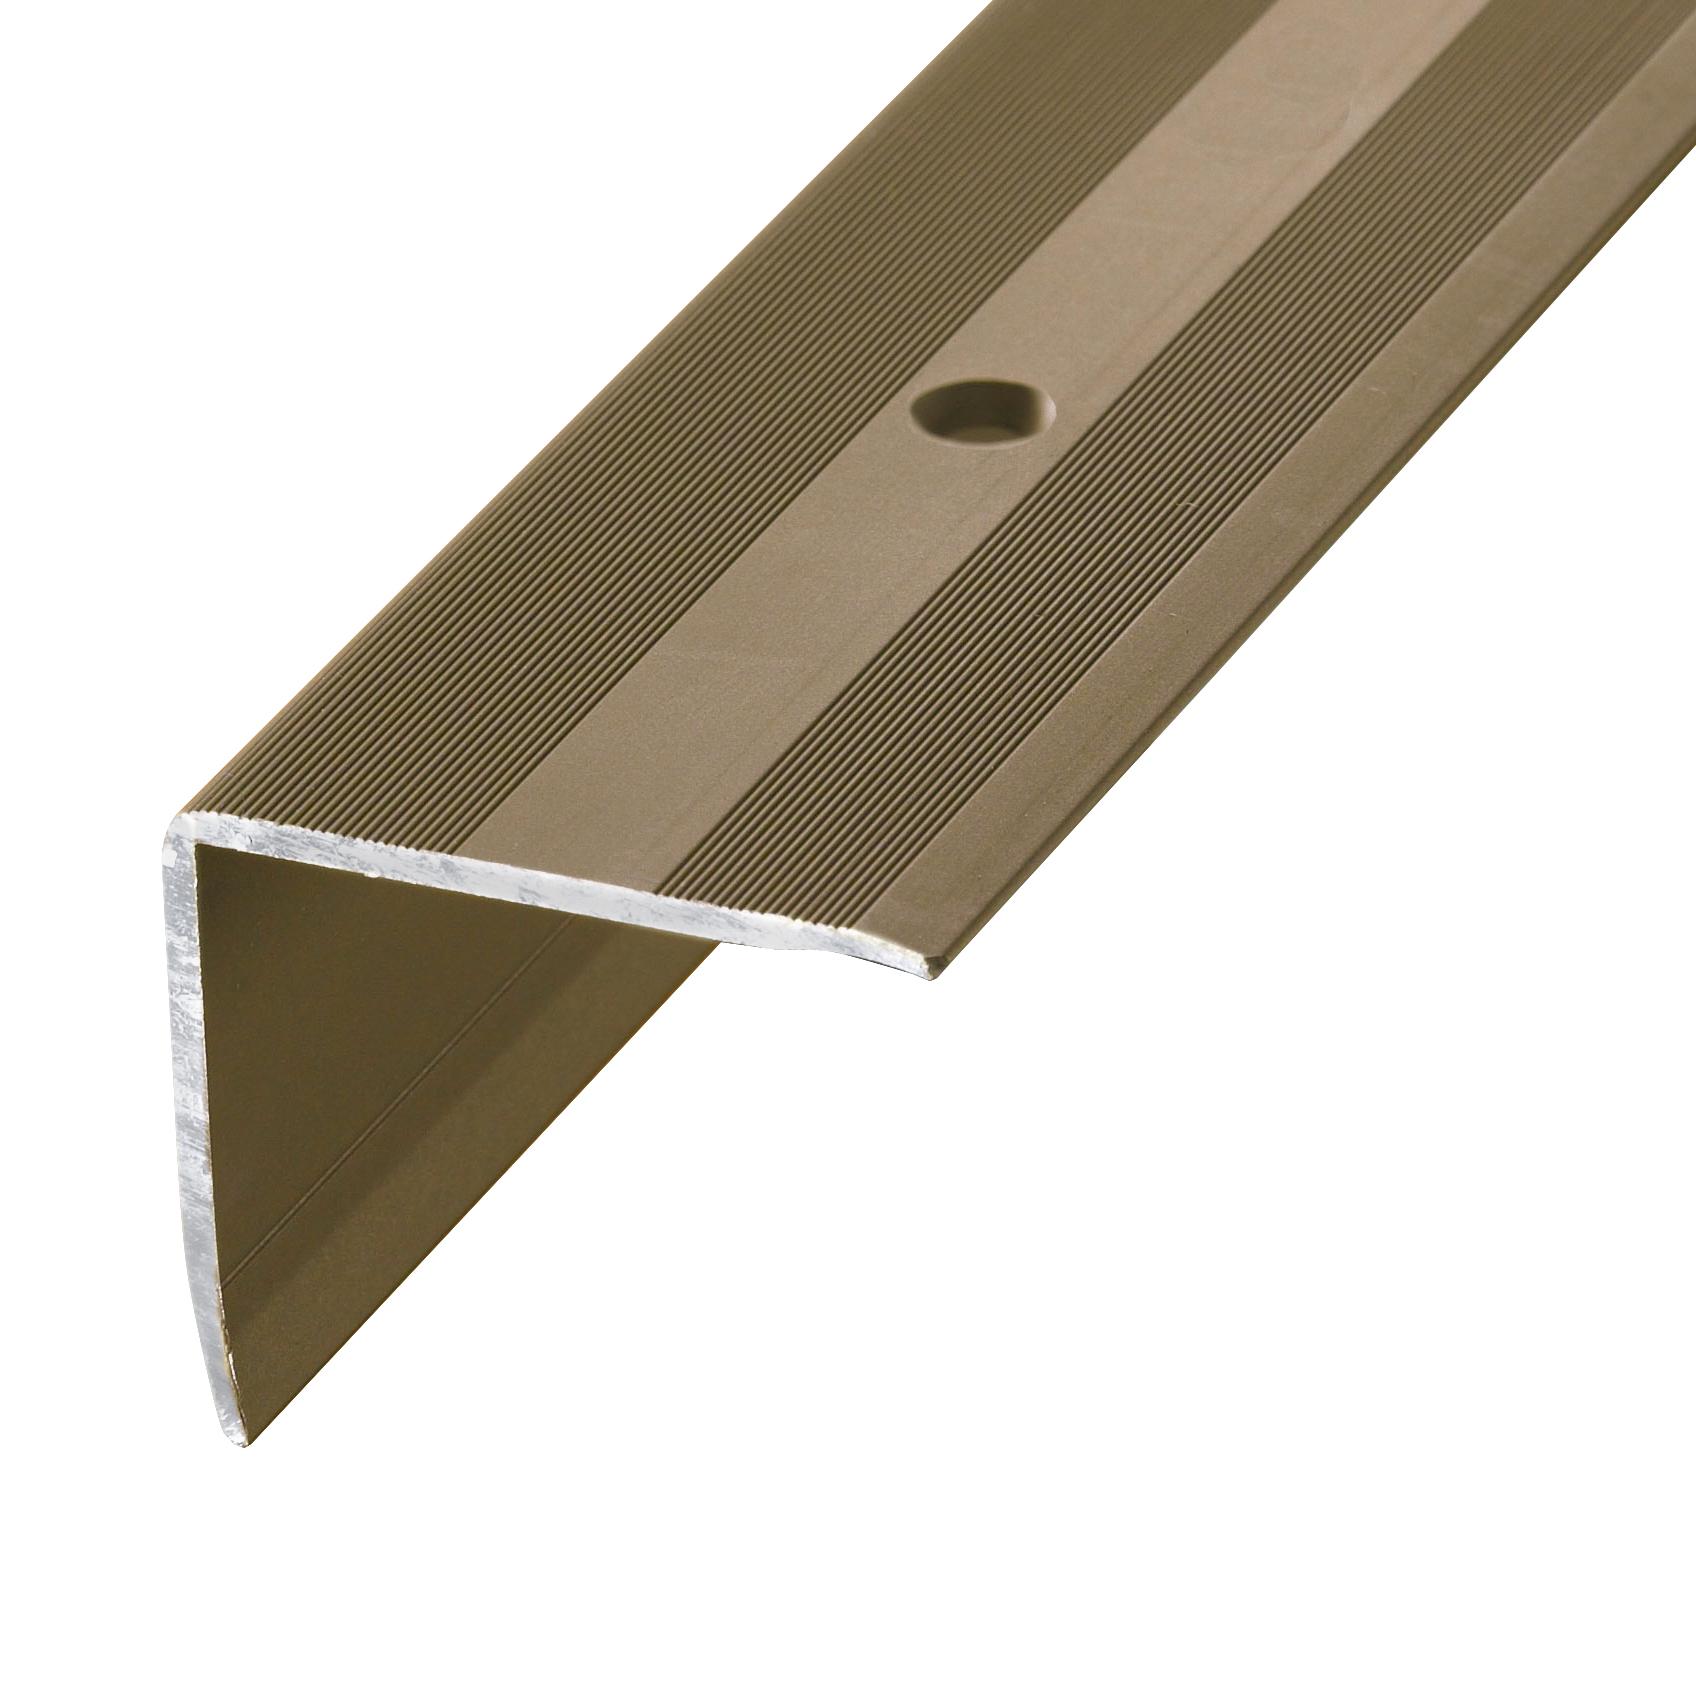 Stair nosing profile alu bronze